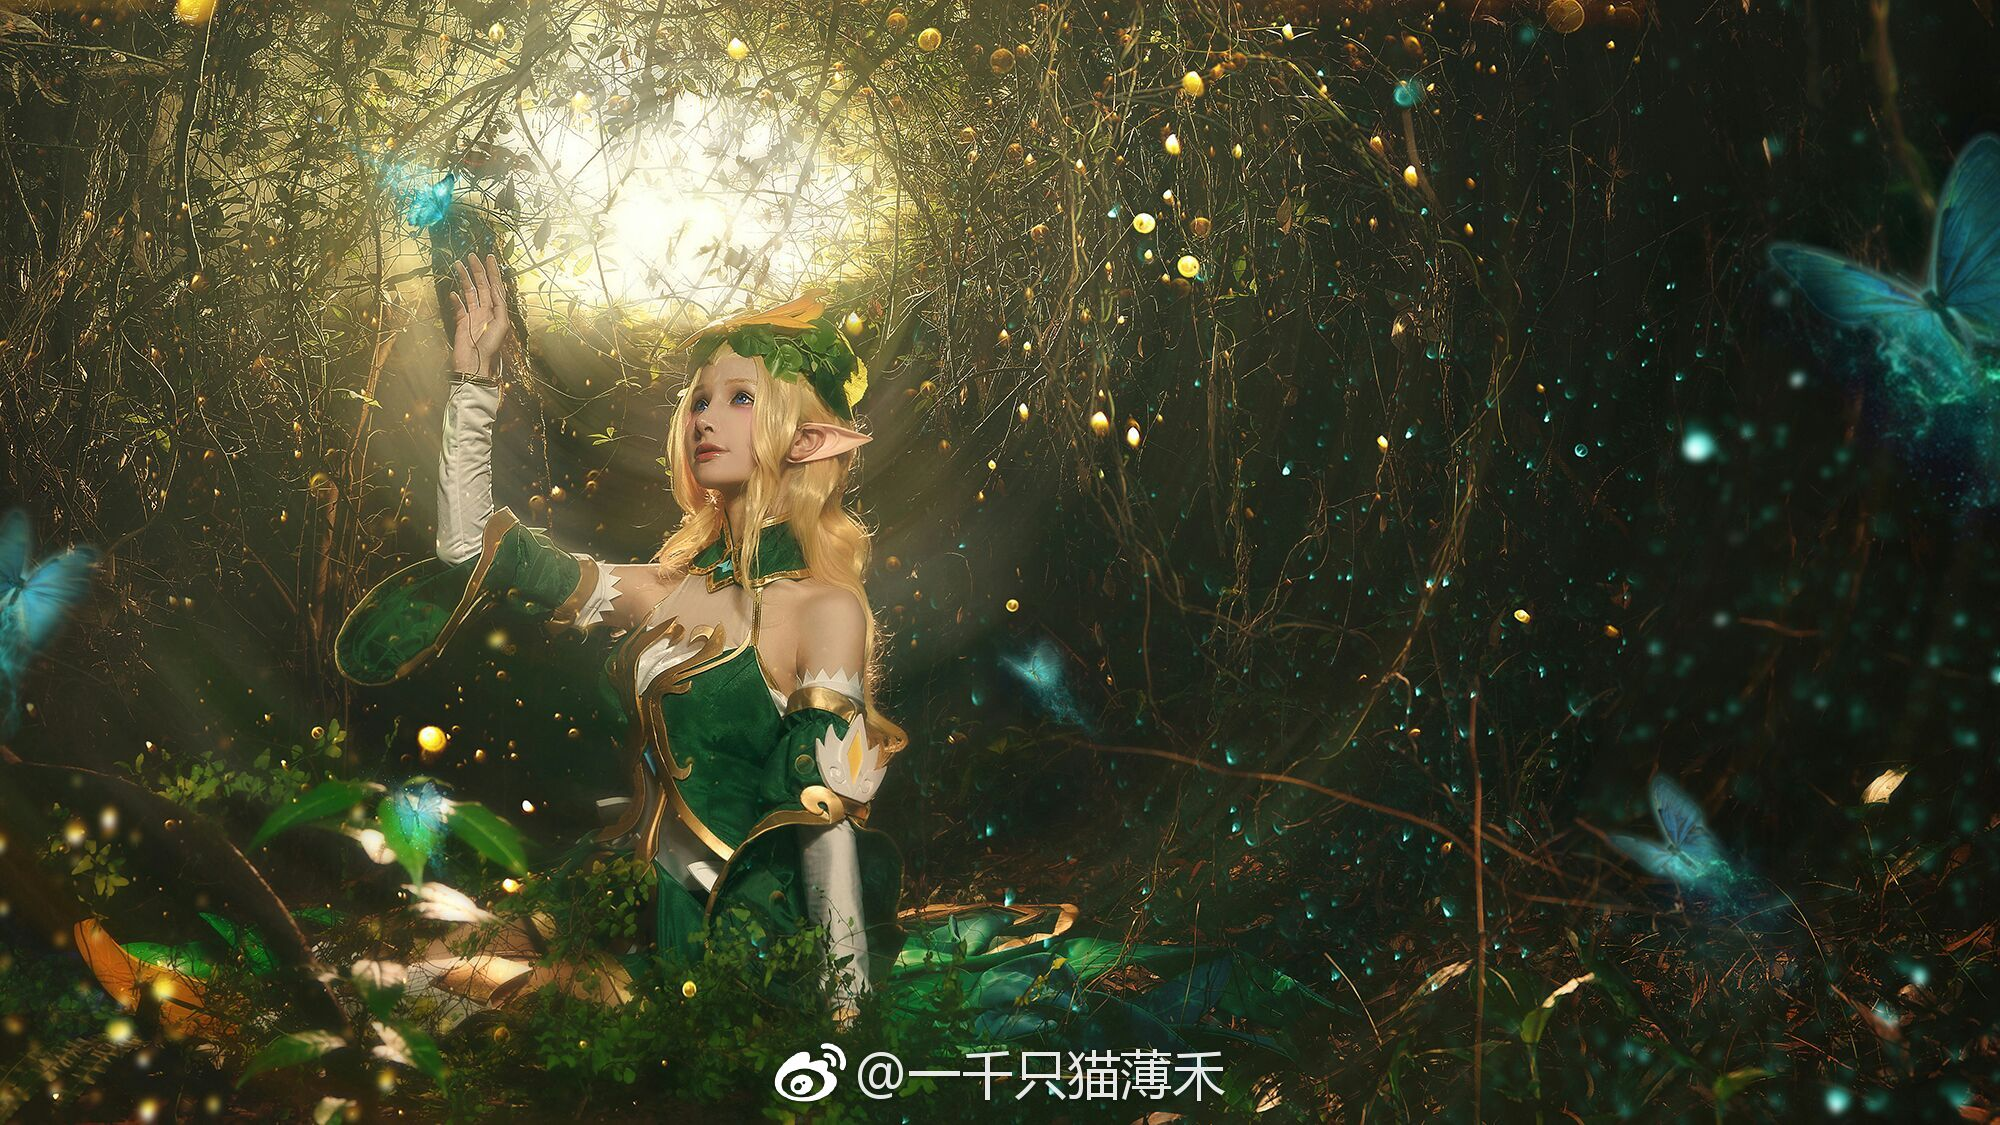 【cos正片】王者荣耀 王昭君精灵公主cos欣赏 cn:一千只猫薄禾 cosplay-第3张